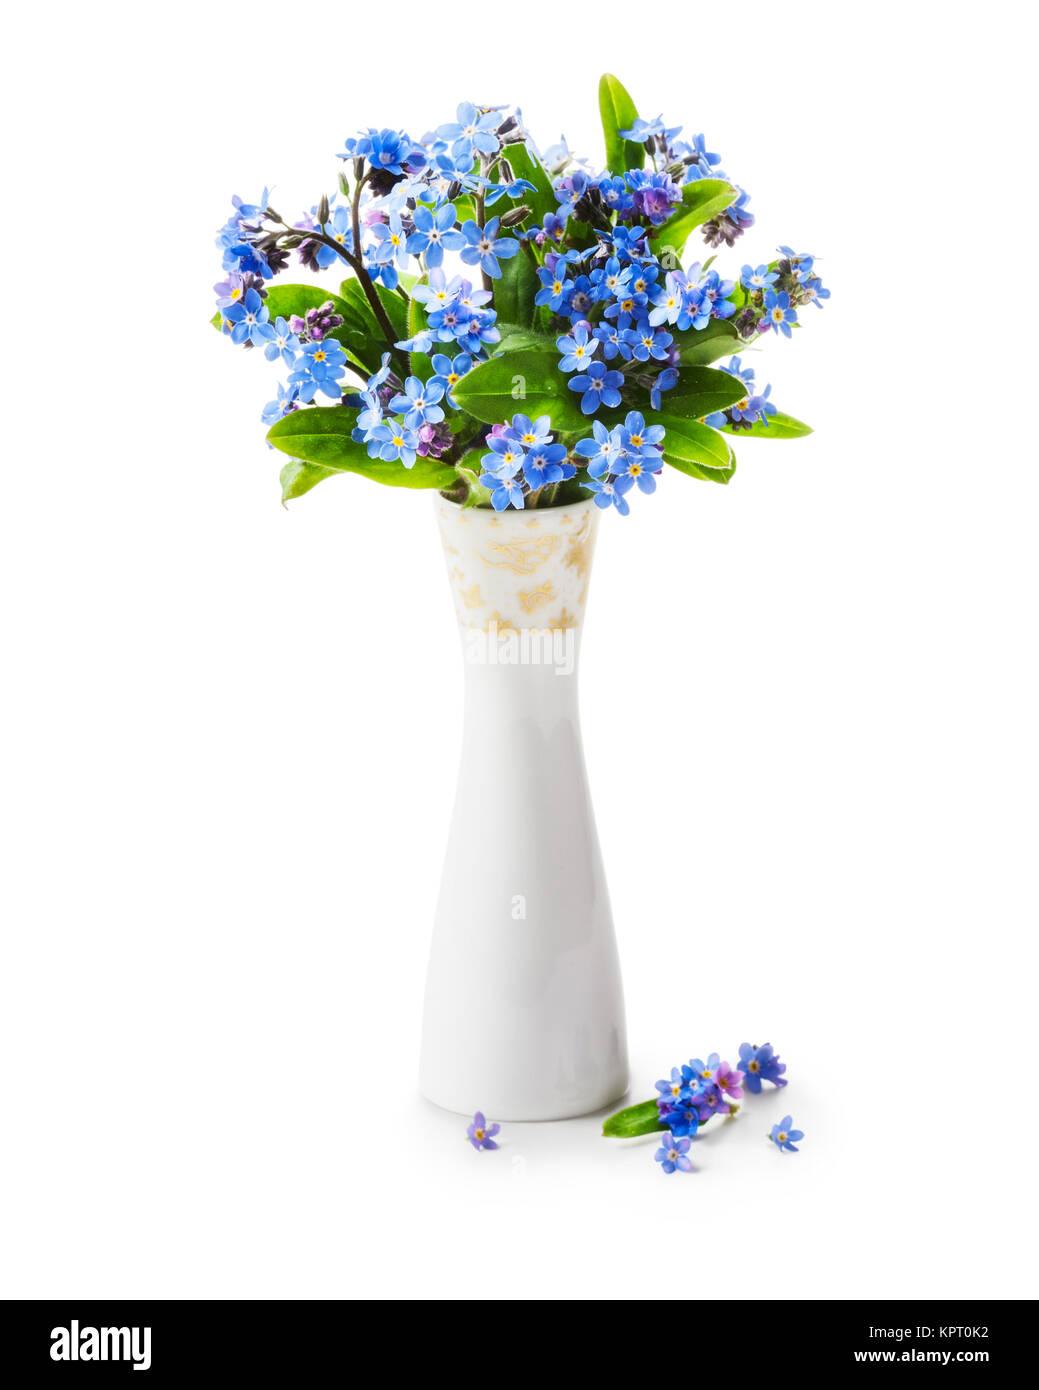 Mazzo Di Fiori Finti.Romantic Bouquet Of Forget Me Not Flowers In Retro Vase Isolated